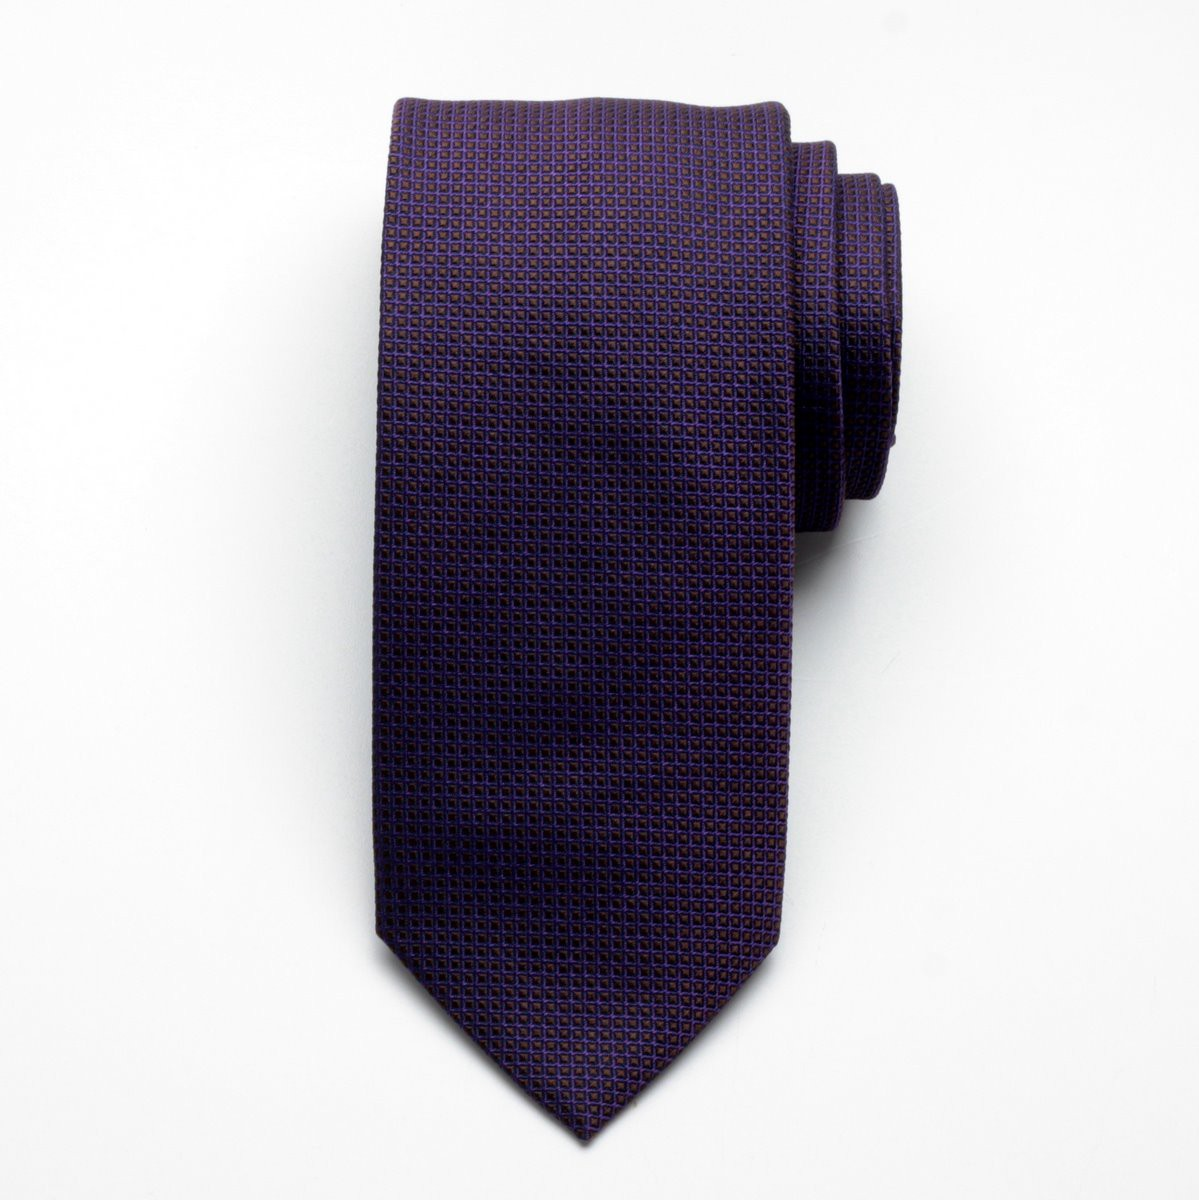 Krawat jedwabny Fine Selection (wzór 84)